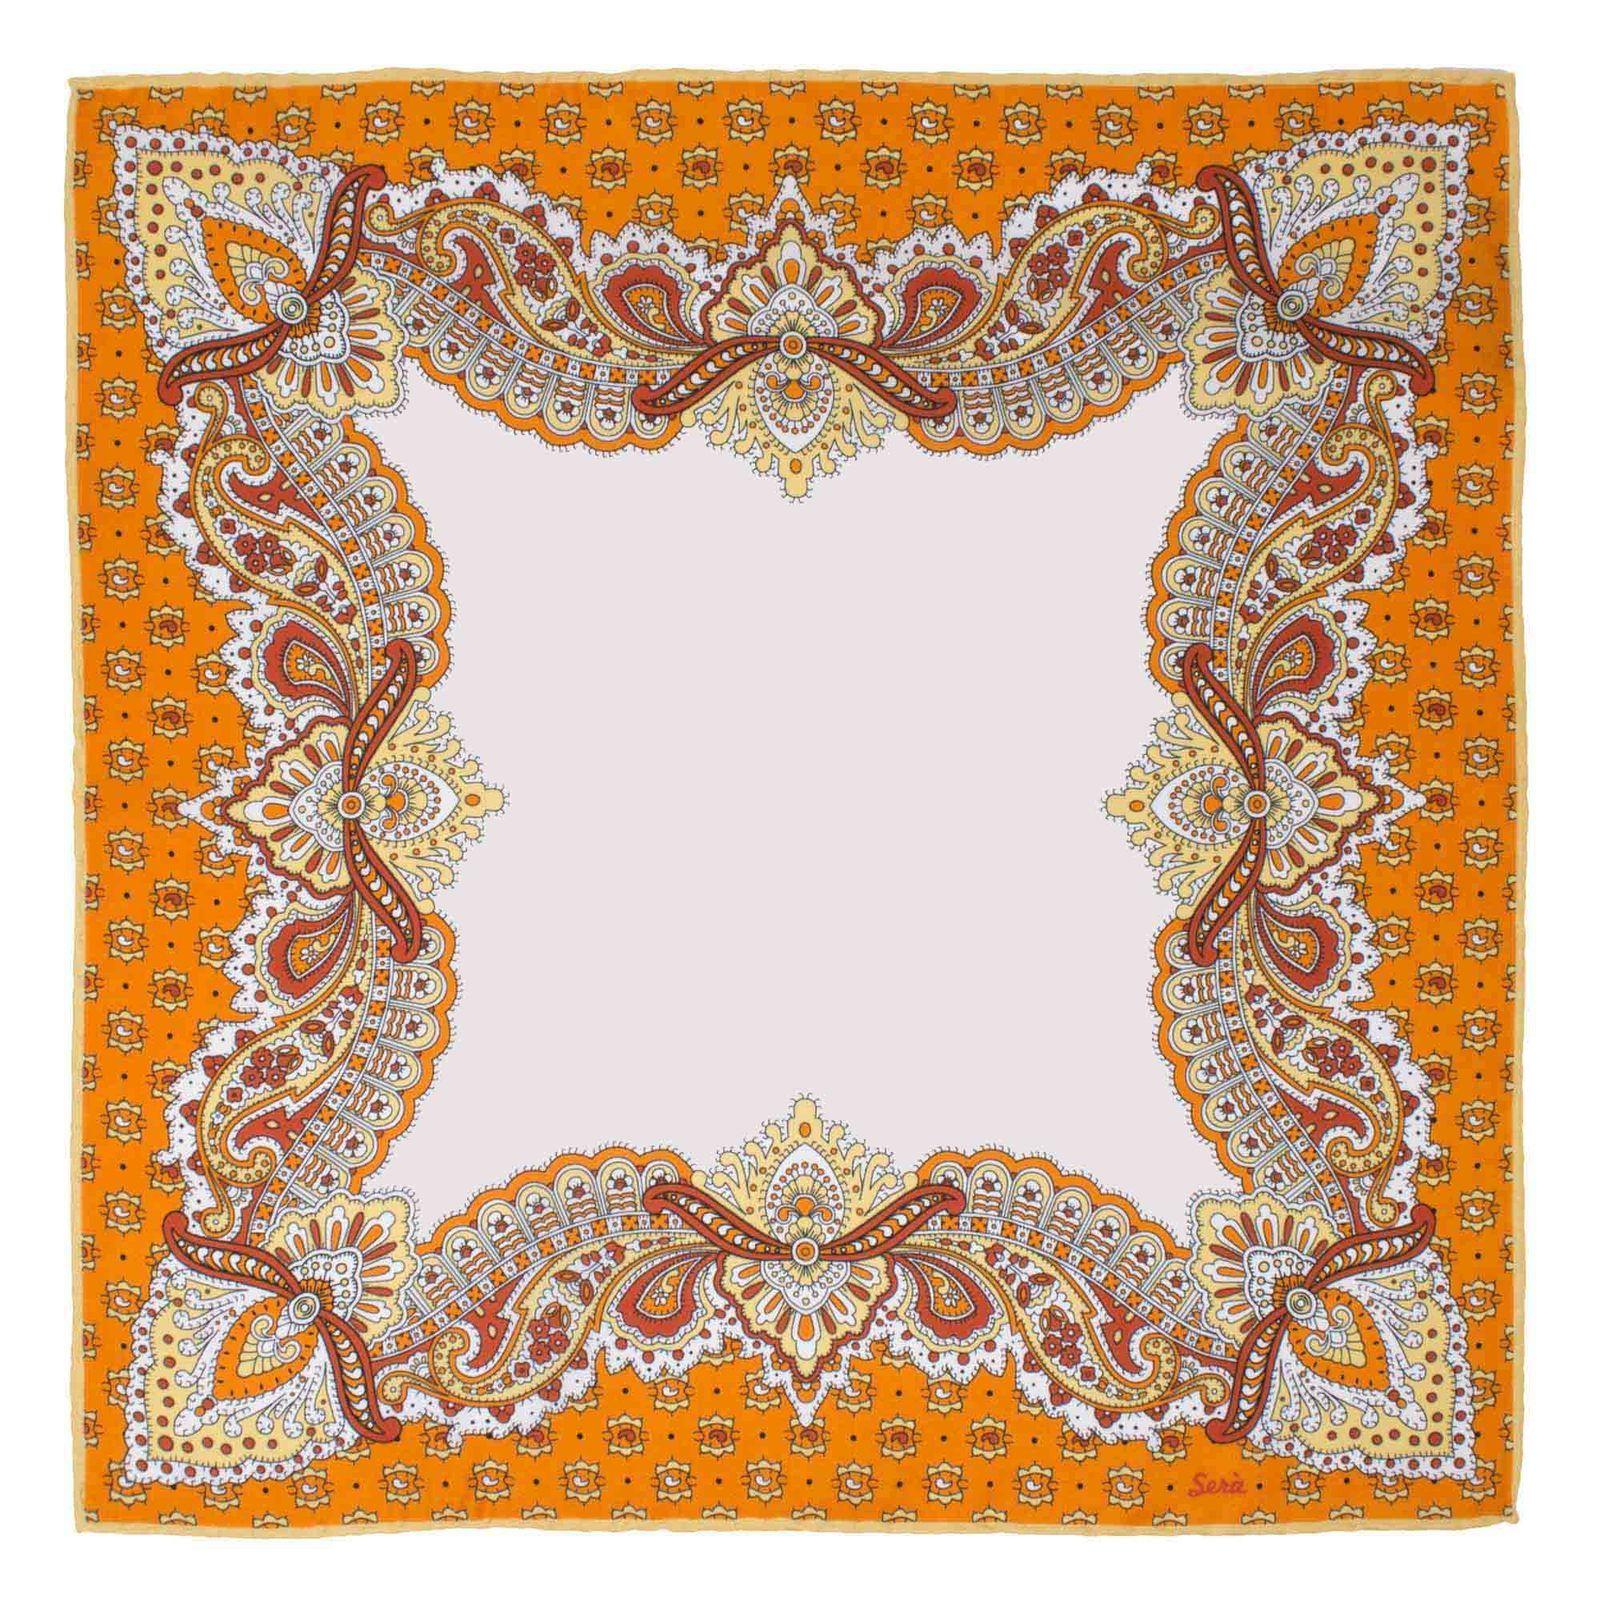 Fiori d'arancio Pocket Square